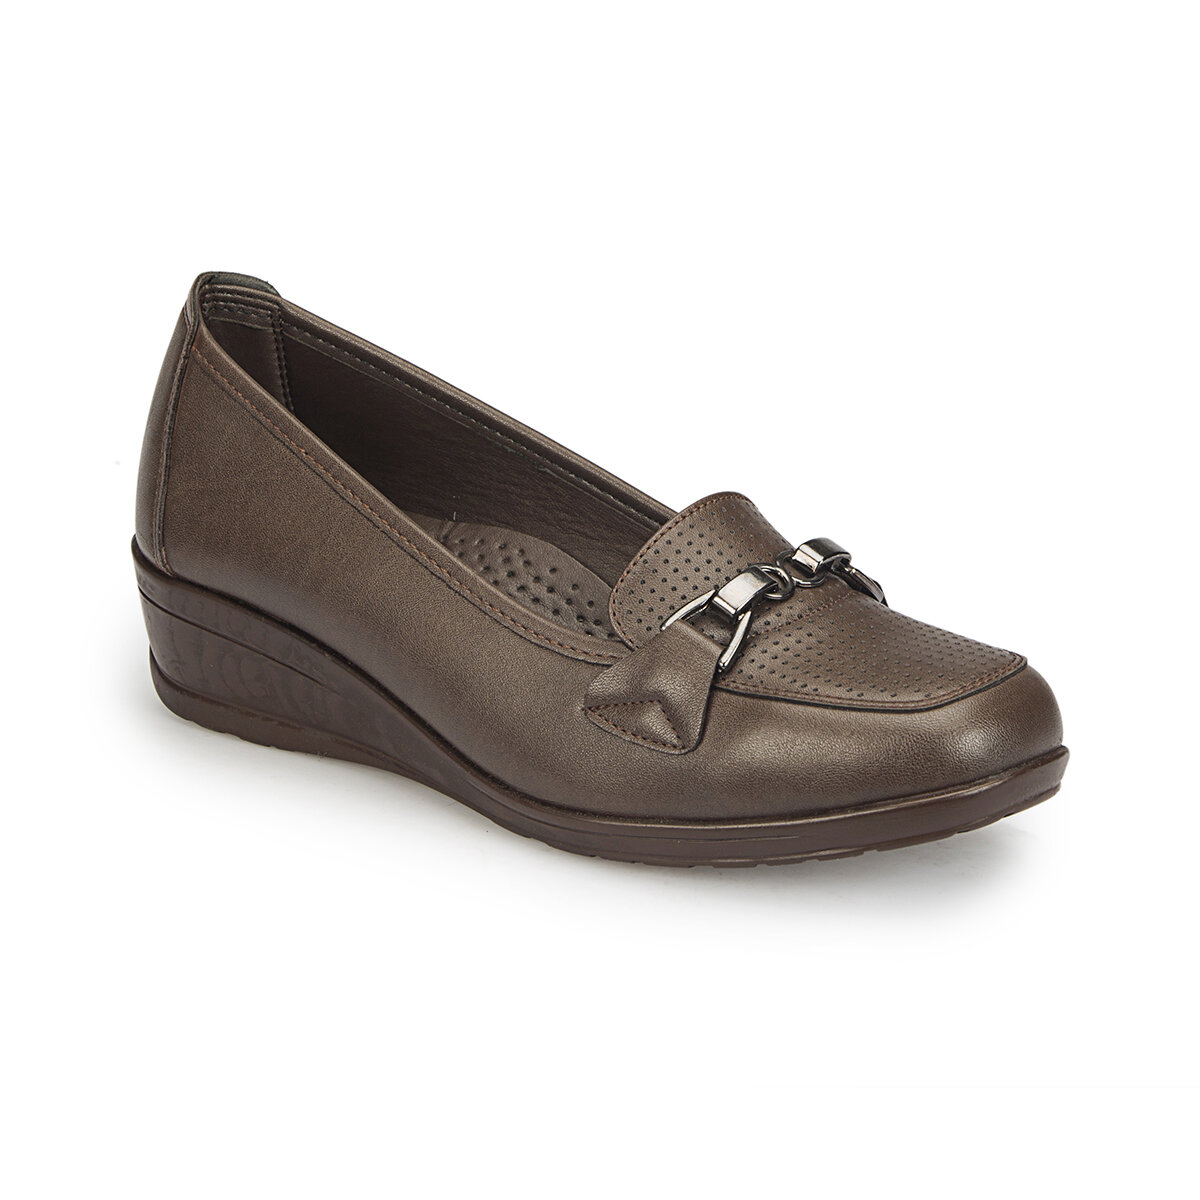 FLO 81.158485.Z Brown Women Basic Comfort Polaris